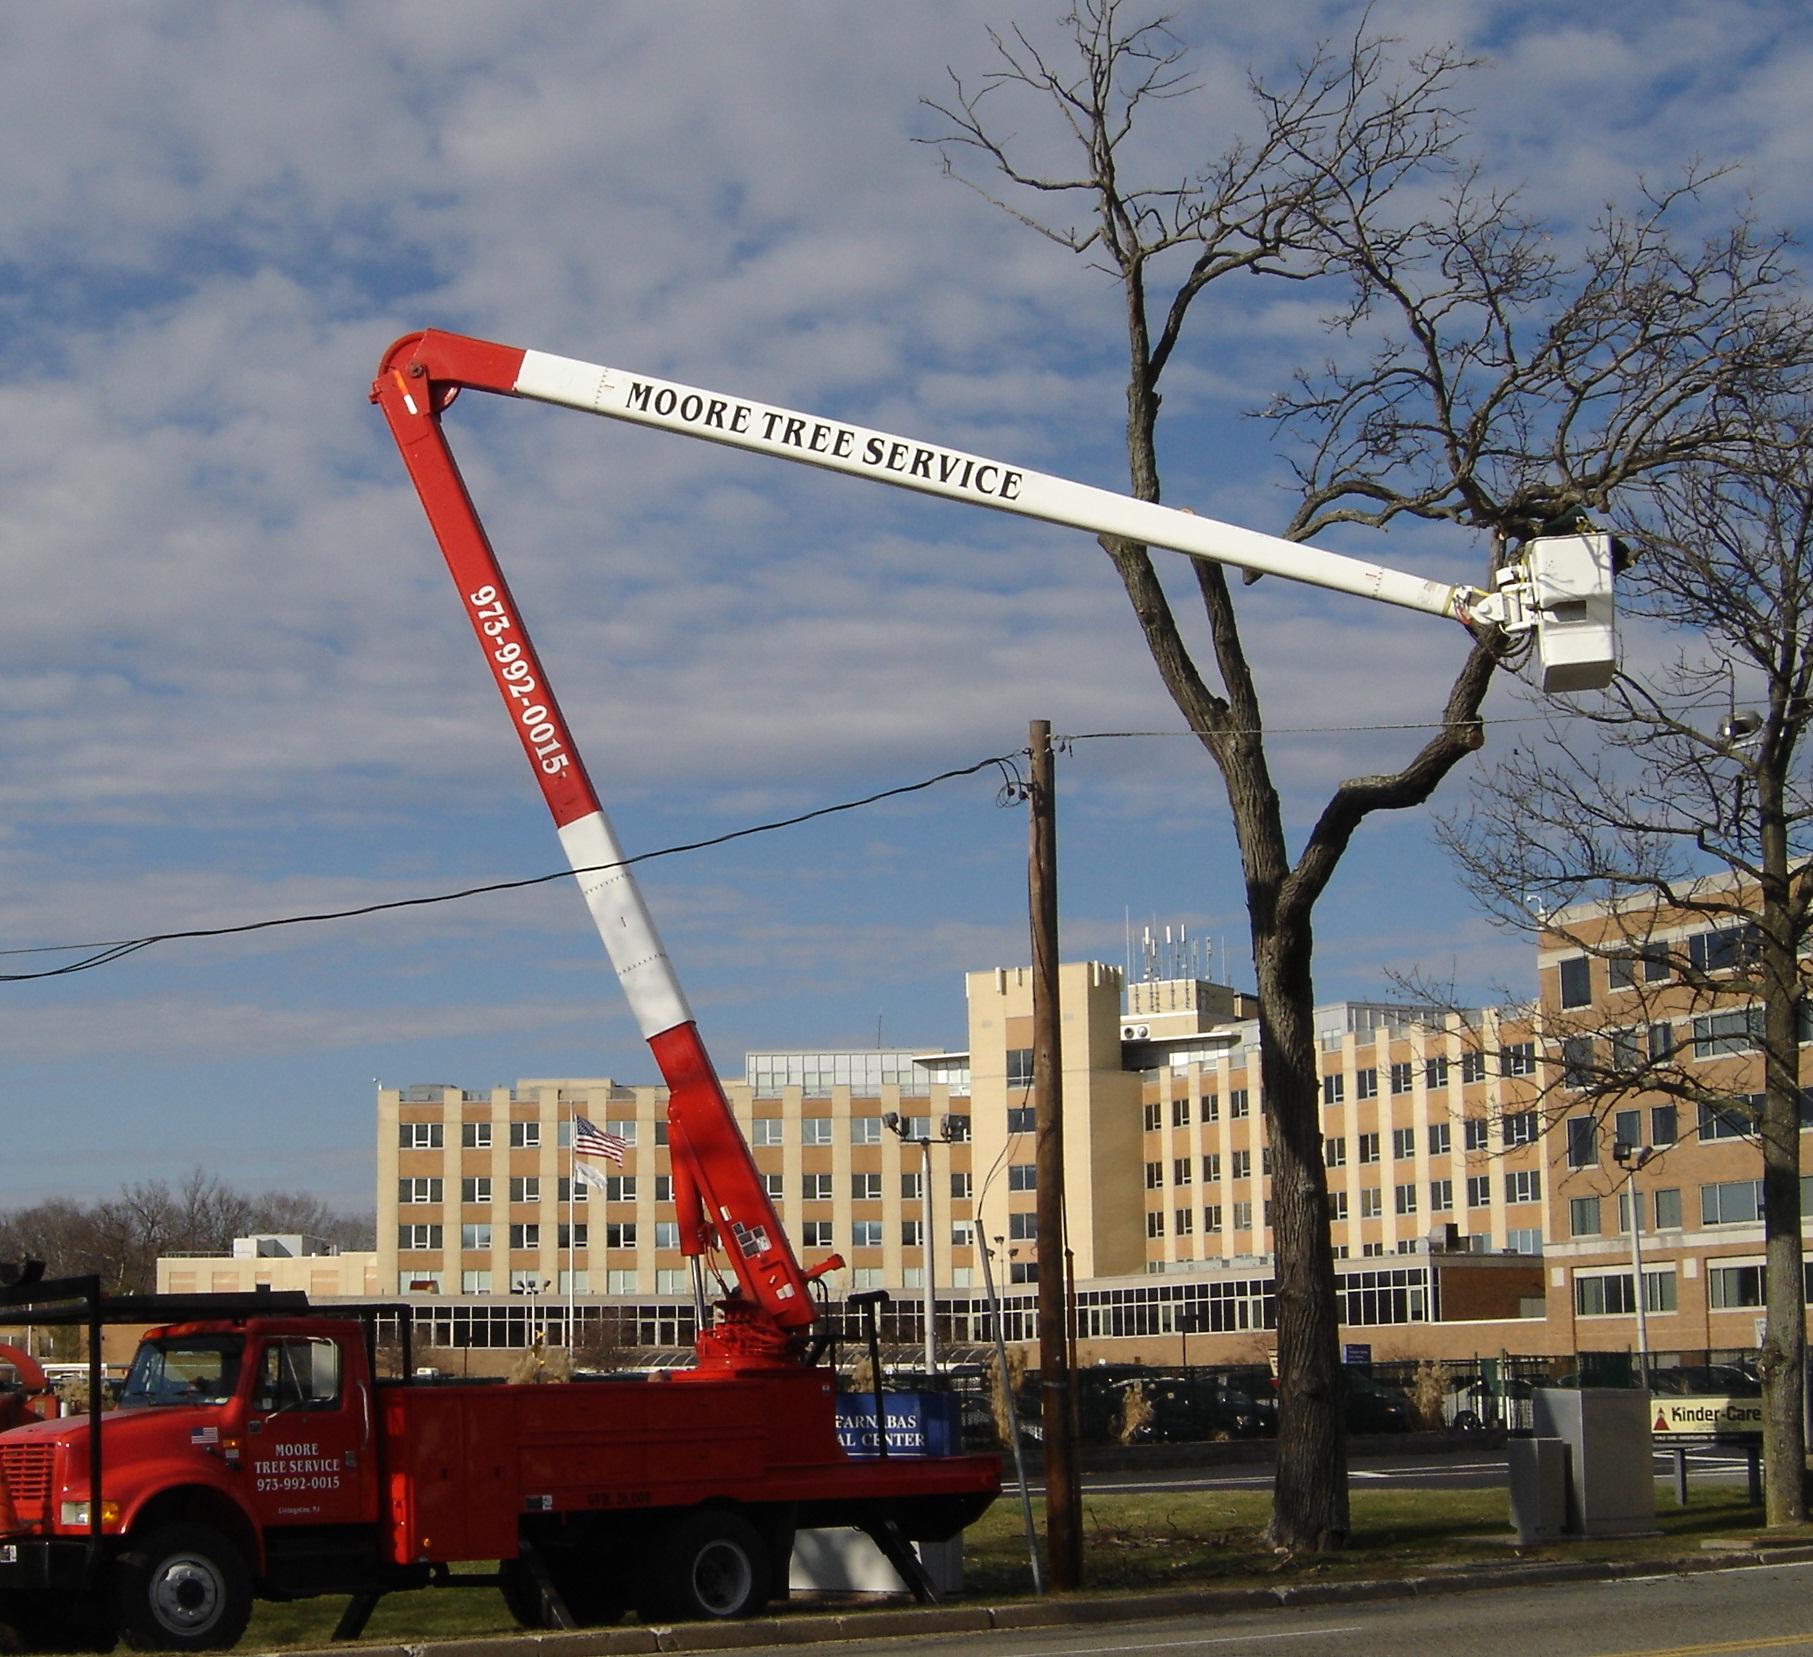 Moores Tree Service